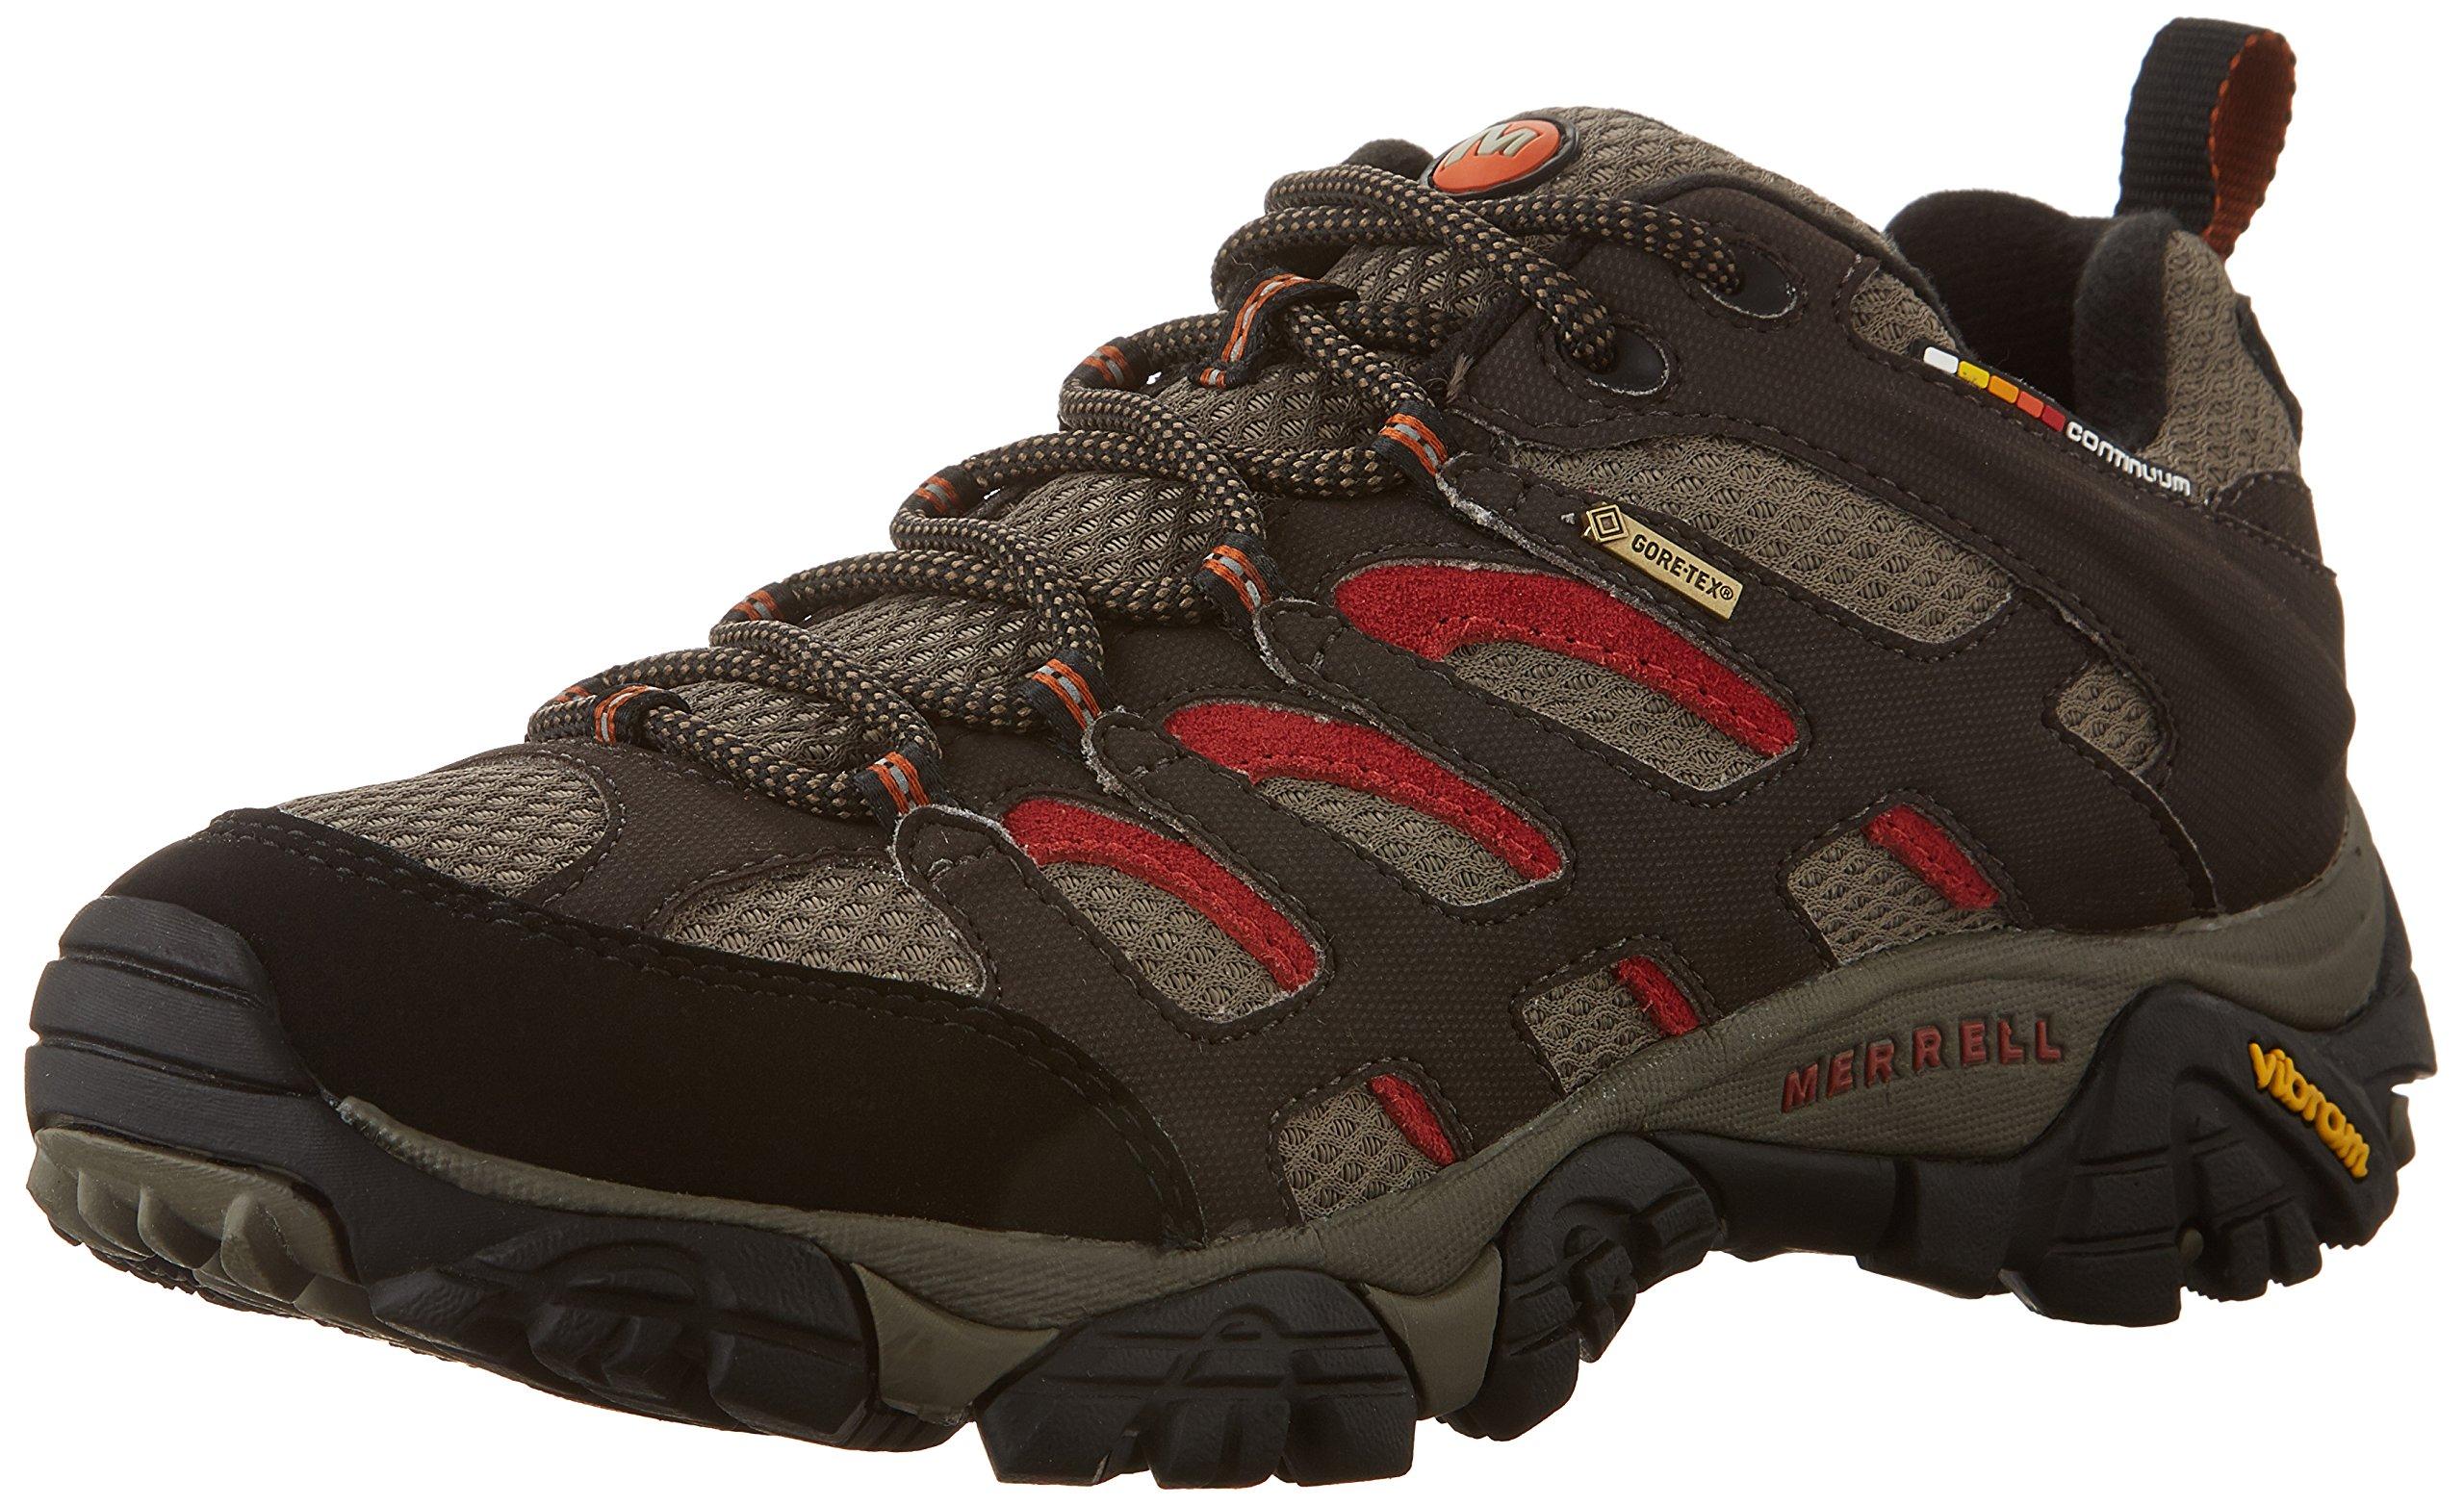 Merrell Men's Moab Gore-Tex Hiking Shoe, Dark